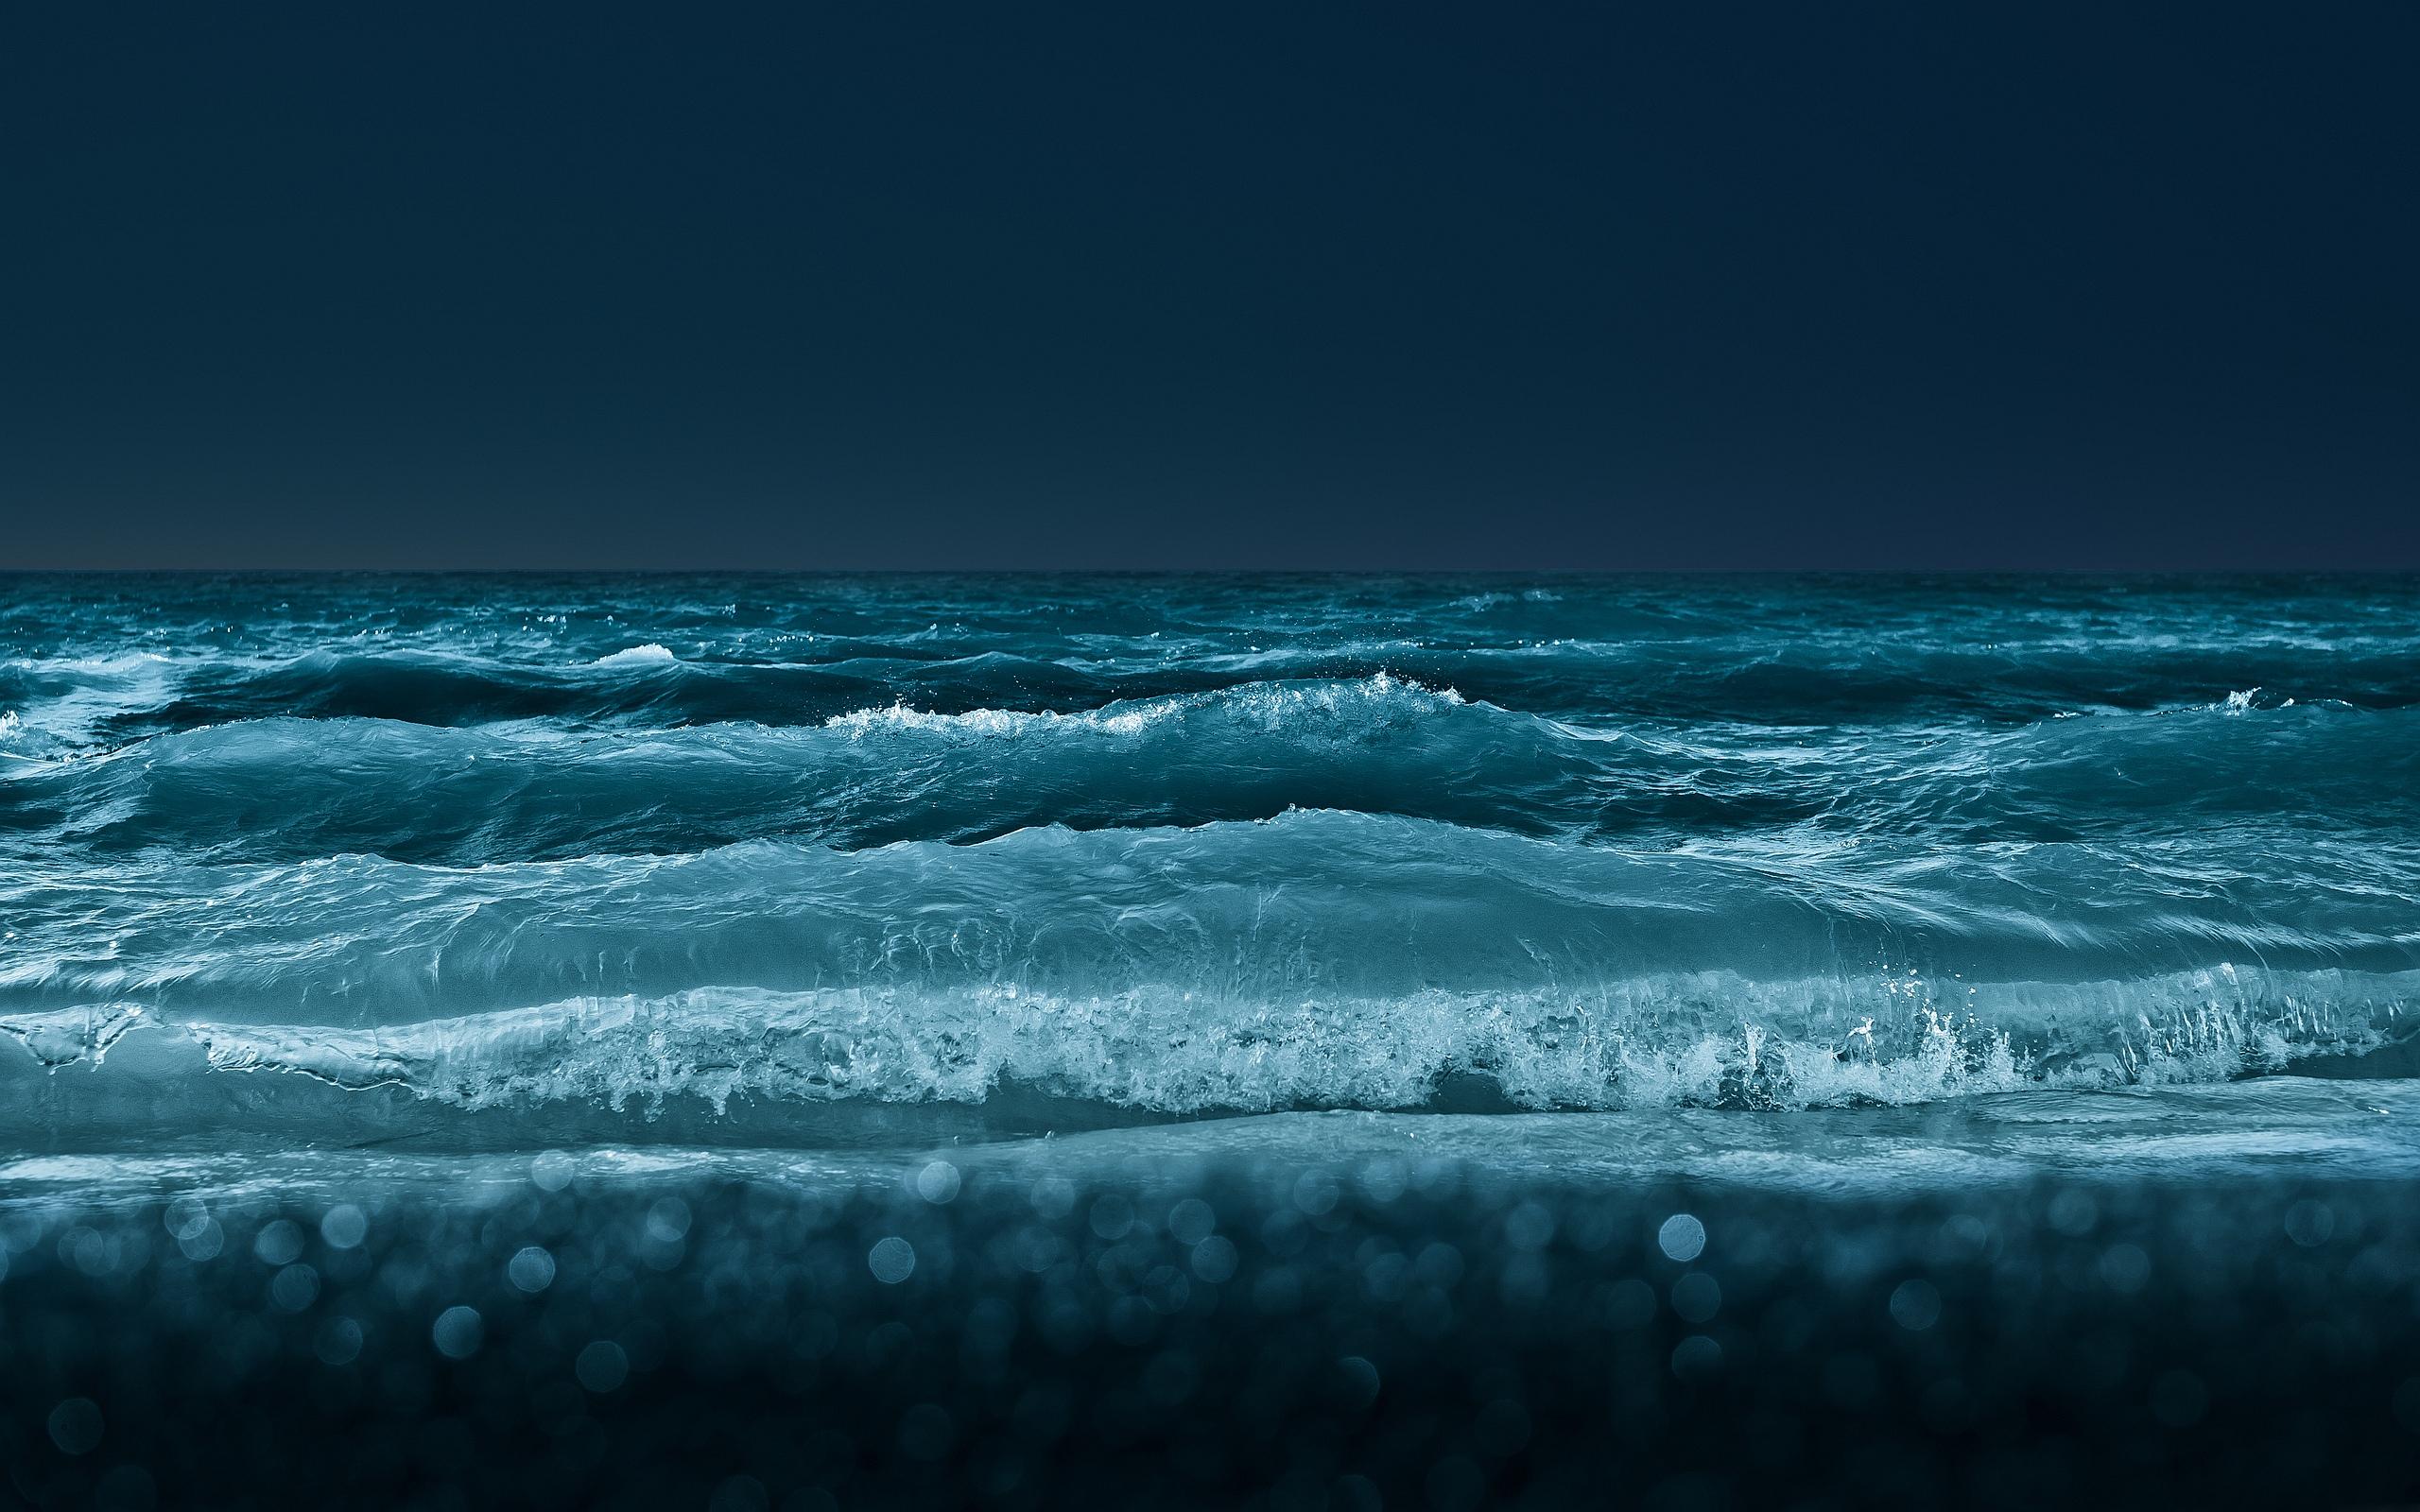 best ocean wallpapers - hd desktop wallpapers | 4k hd